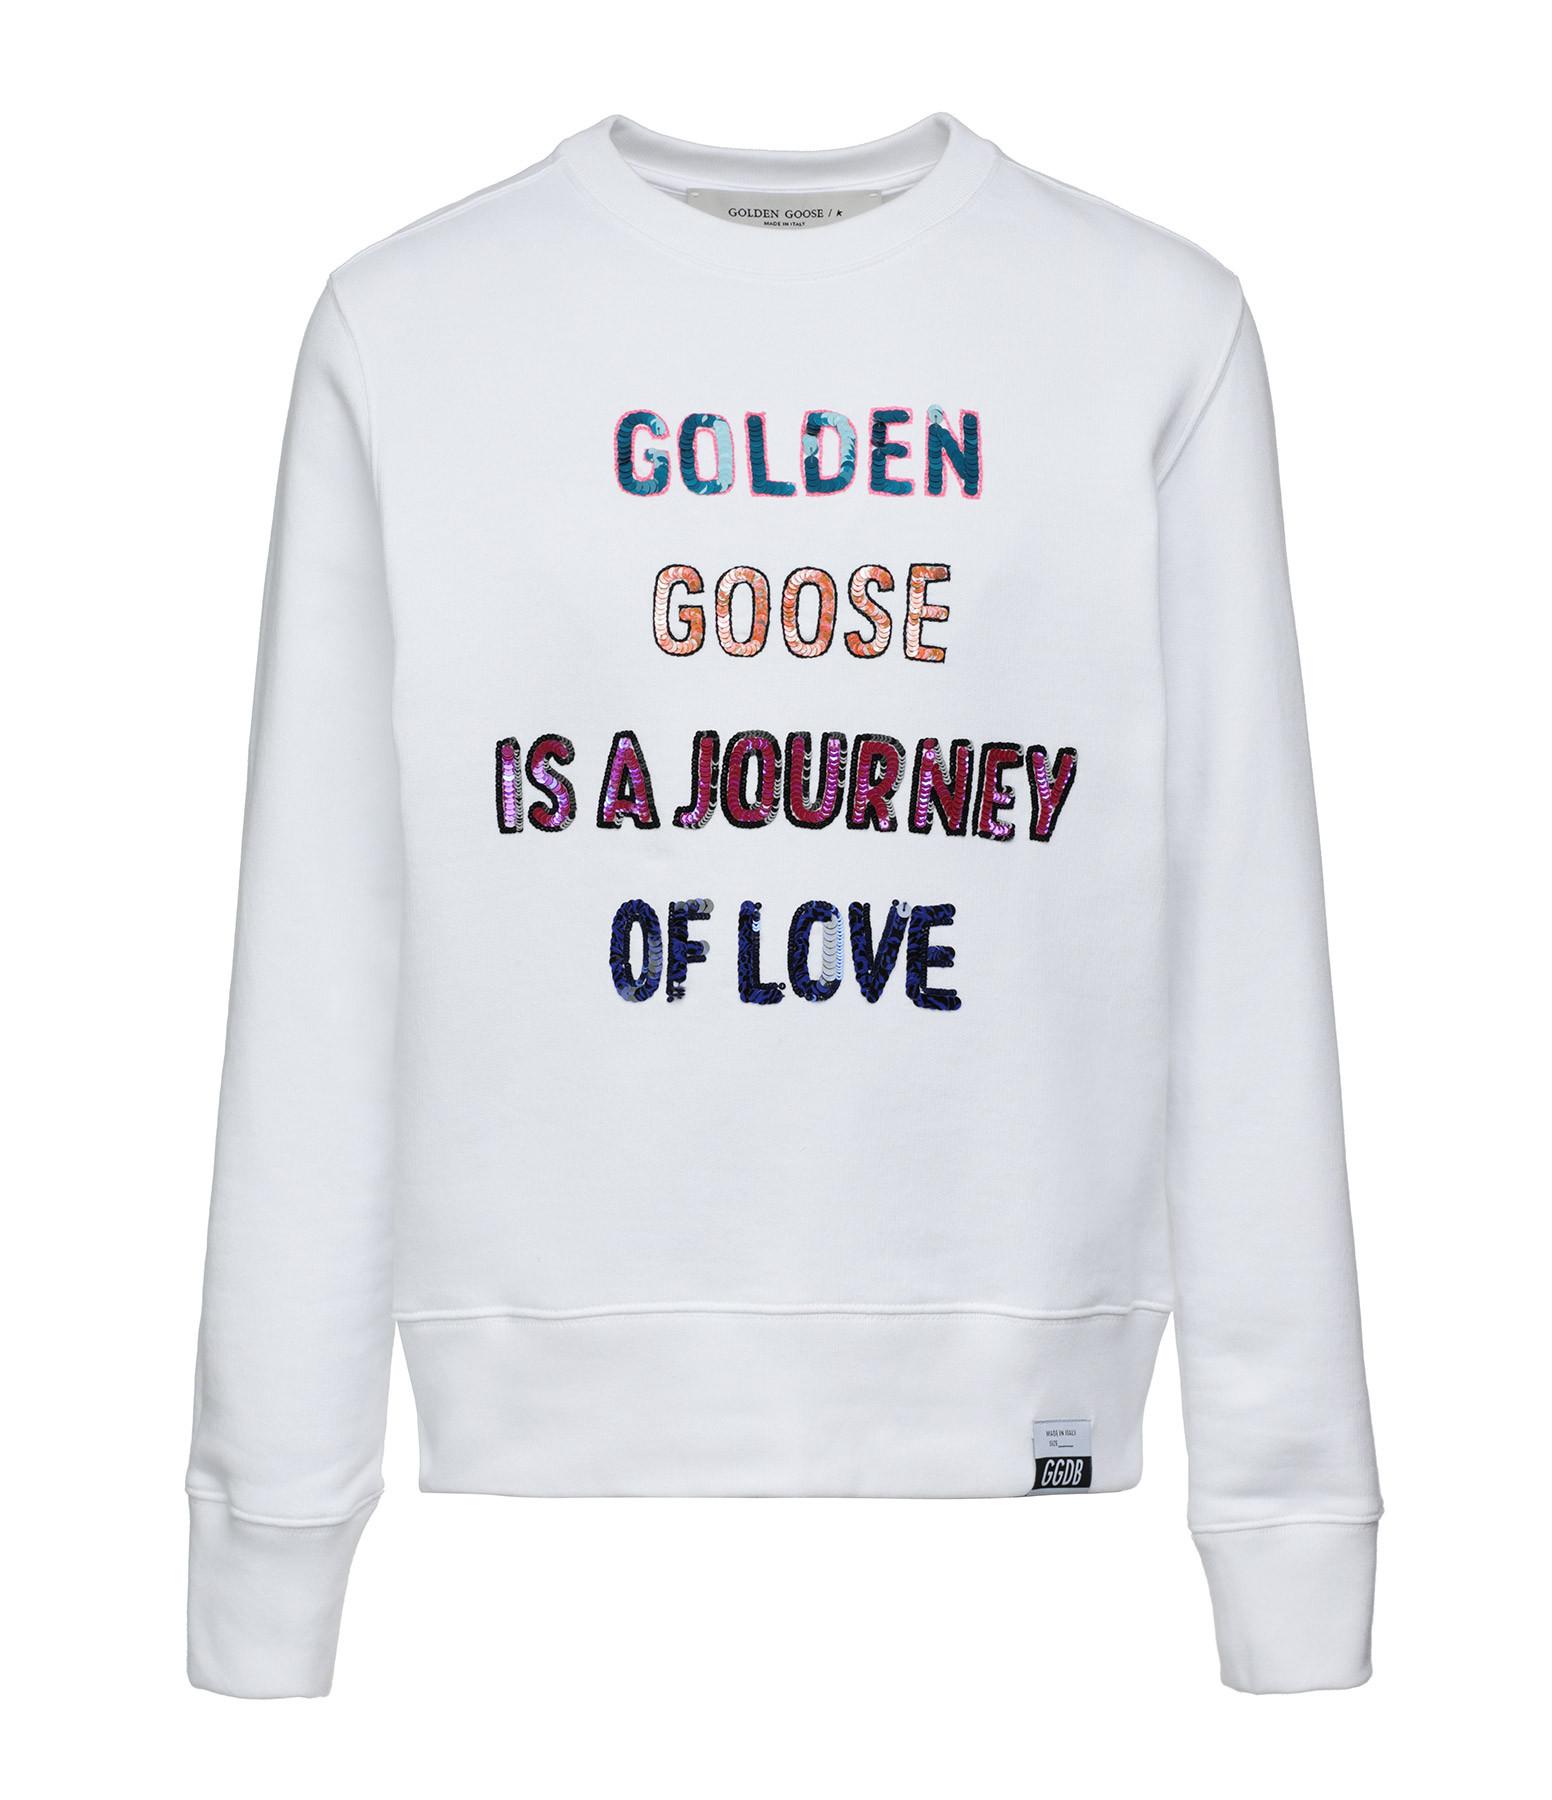 GOLDEN GOOSE - Sweatshirt Athena Journet of Love Coton Blanc